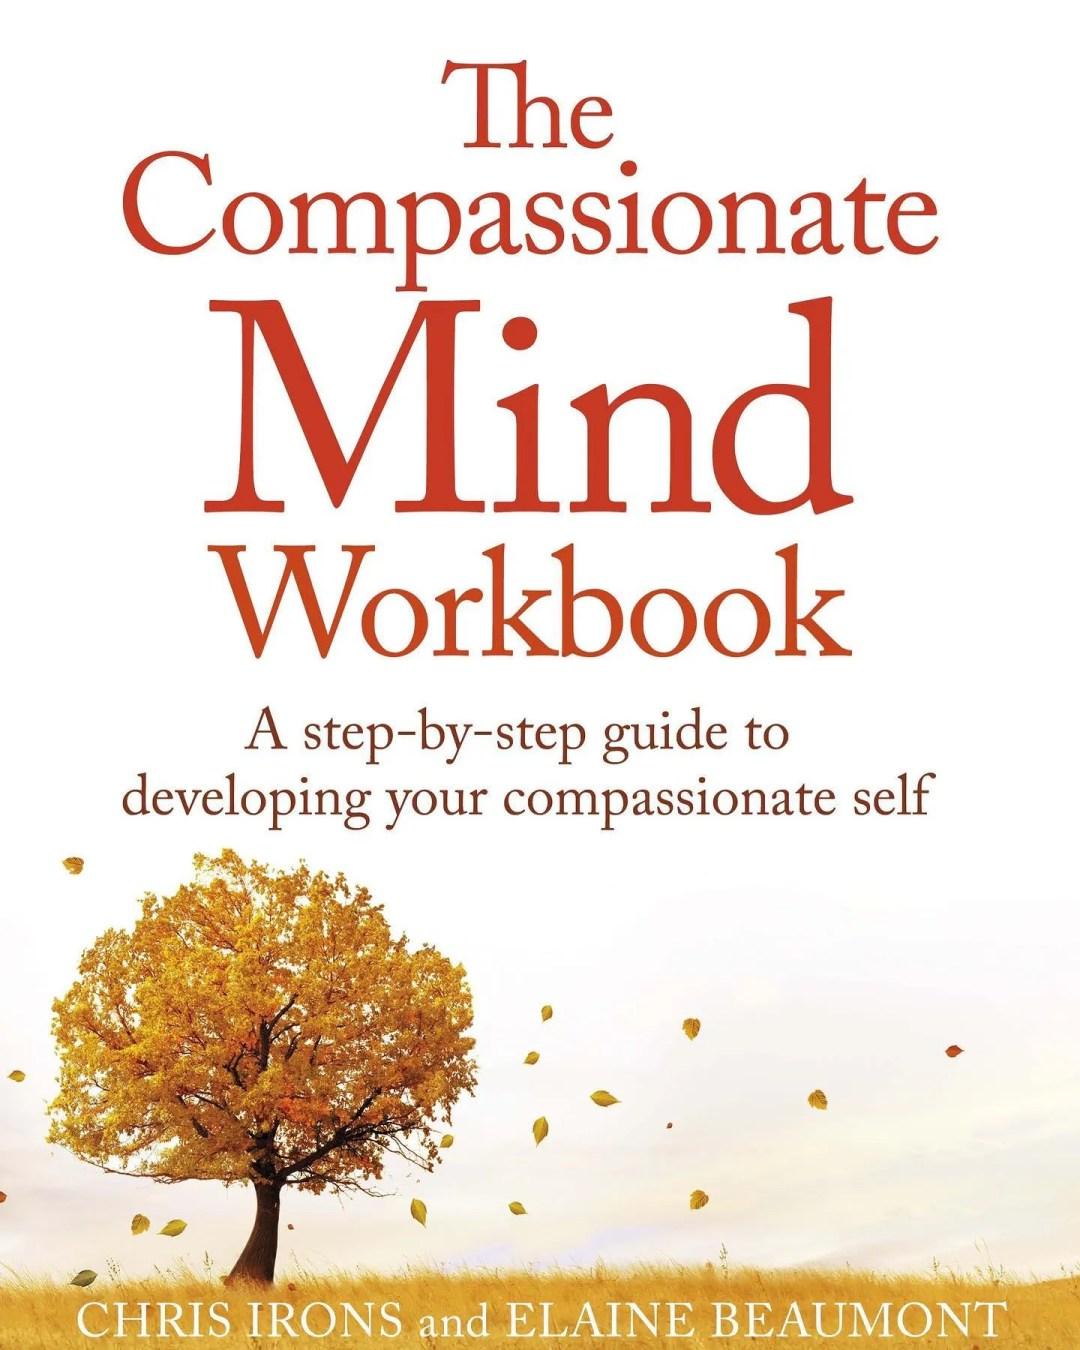 Photo of the Compassionate Mind Workbook